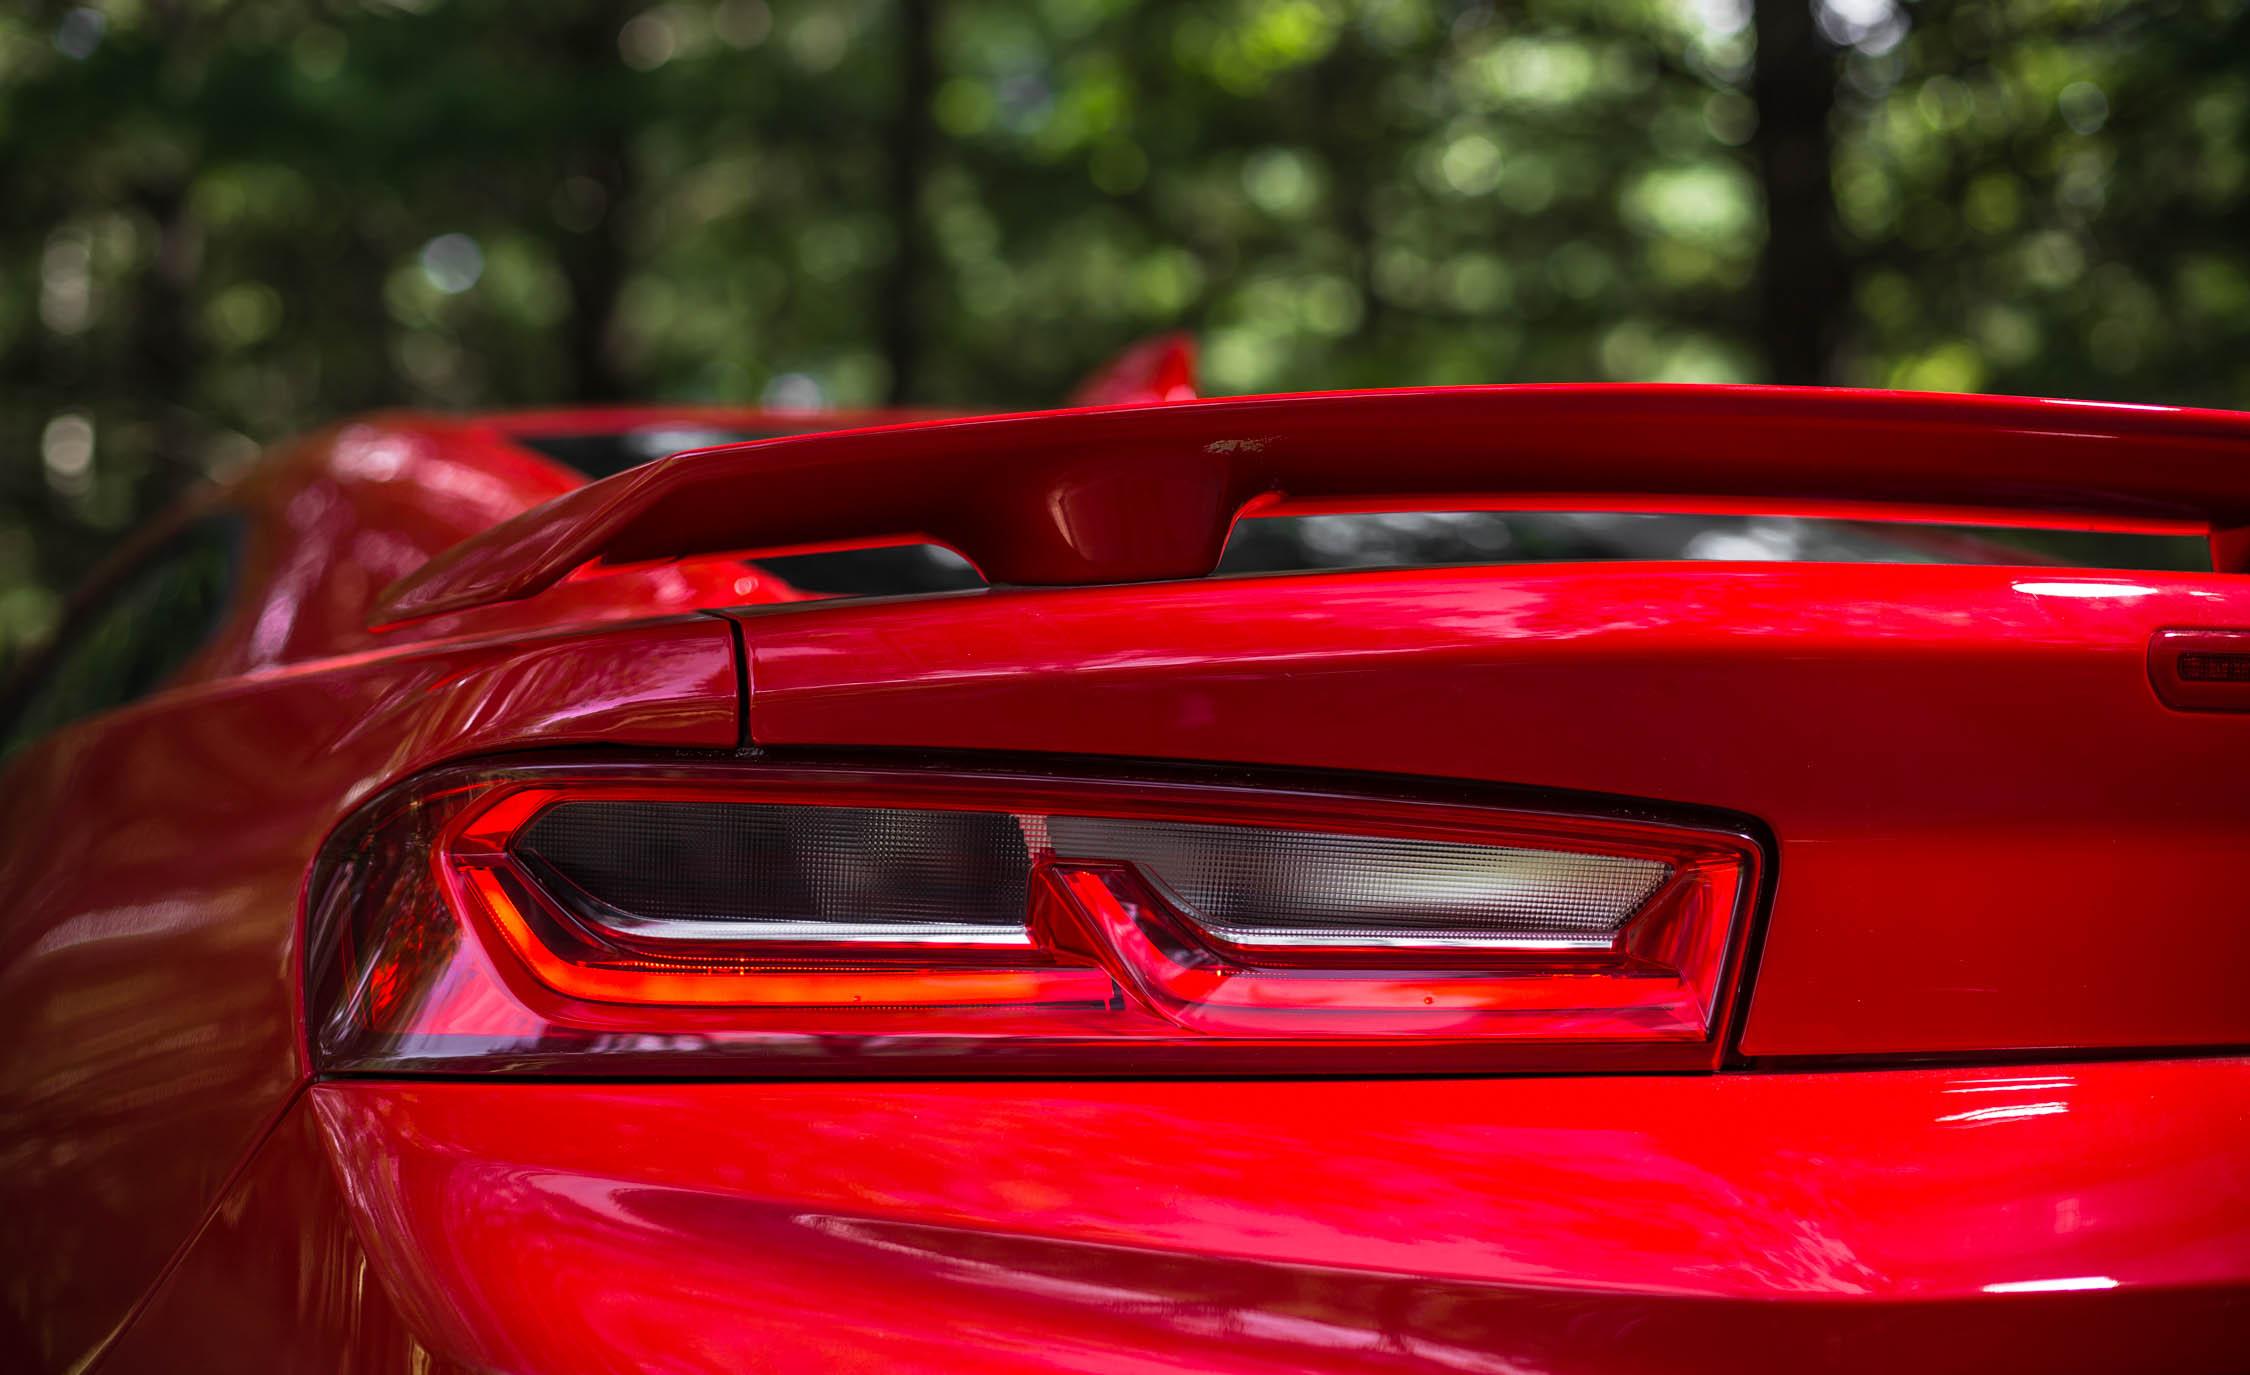 2016 Chevrolet Camaro SS Exterior Left Taillight